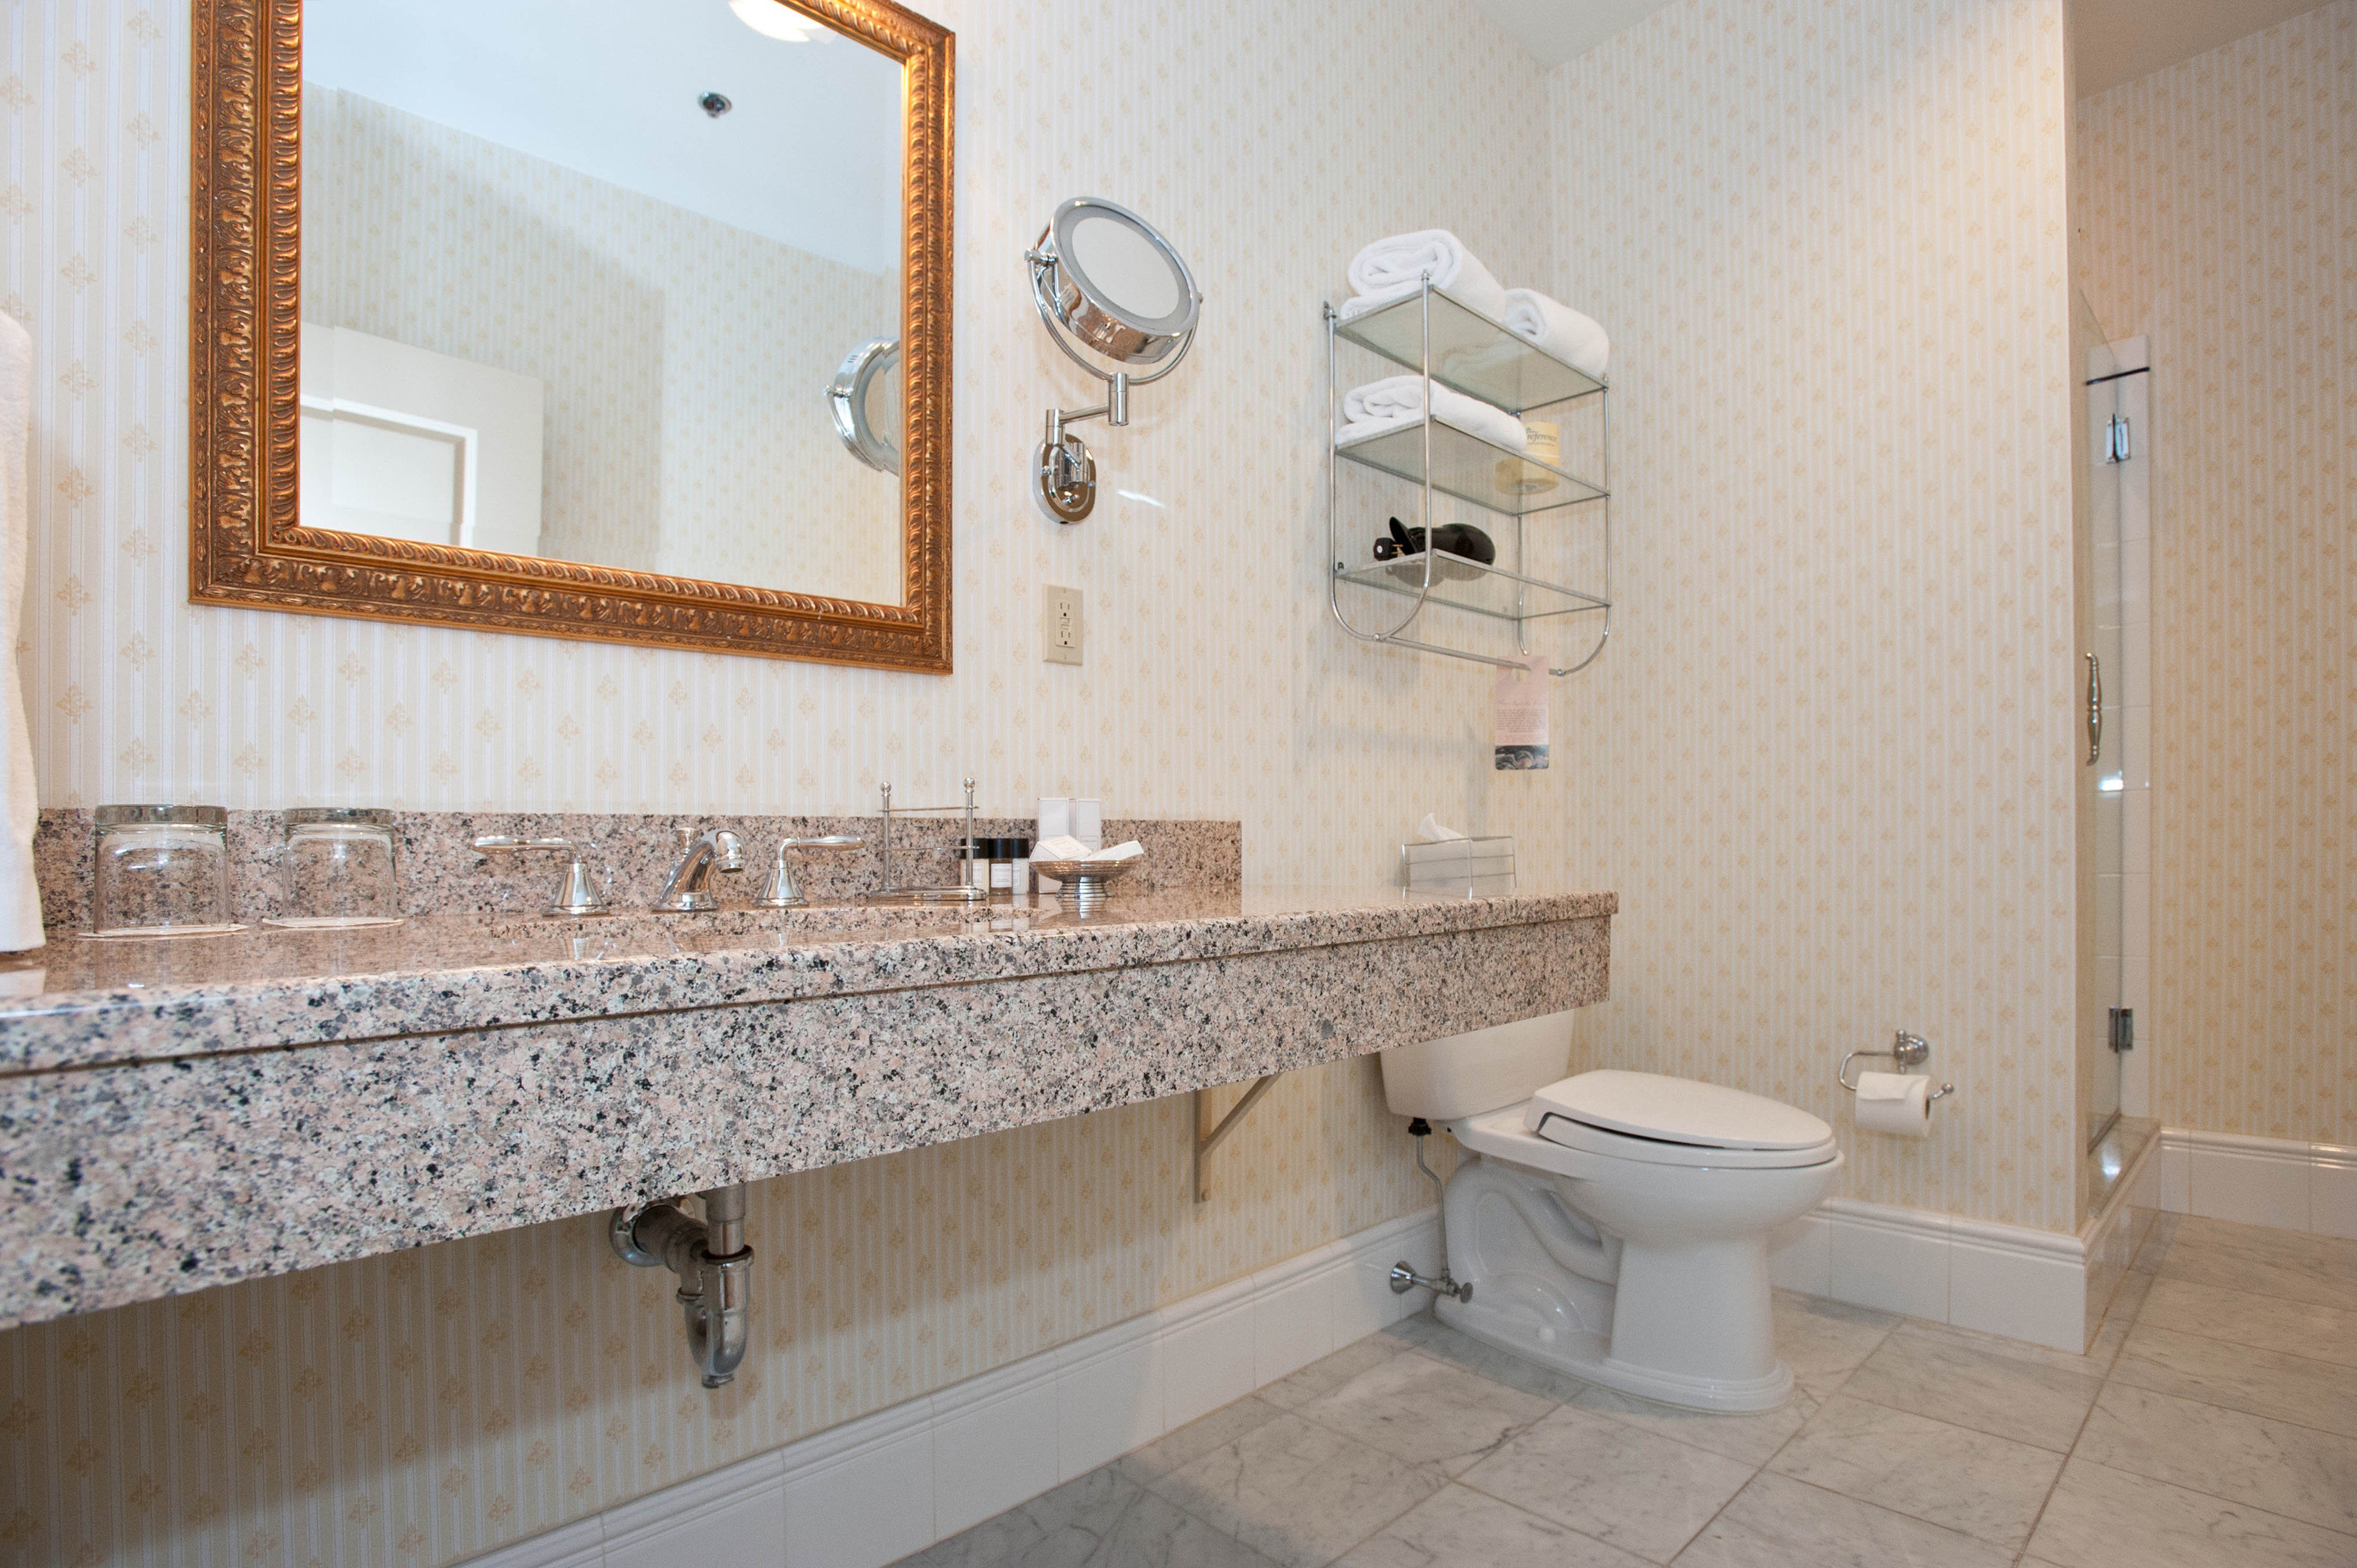 Bath Boutique Classic Historic bathroom sink property home flooring cottage tile tiled